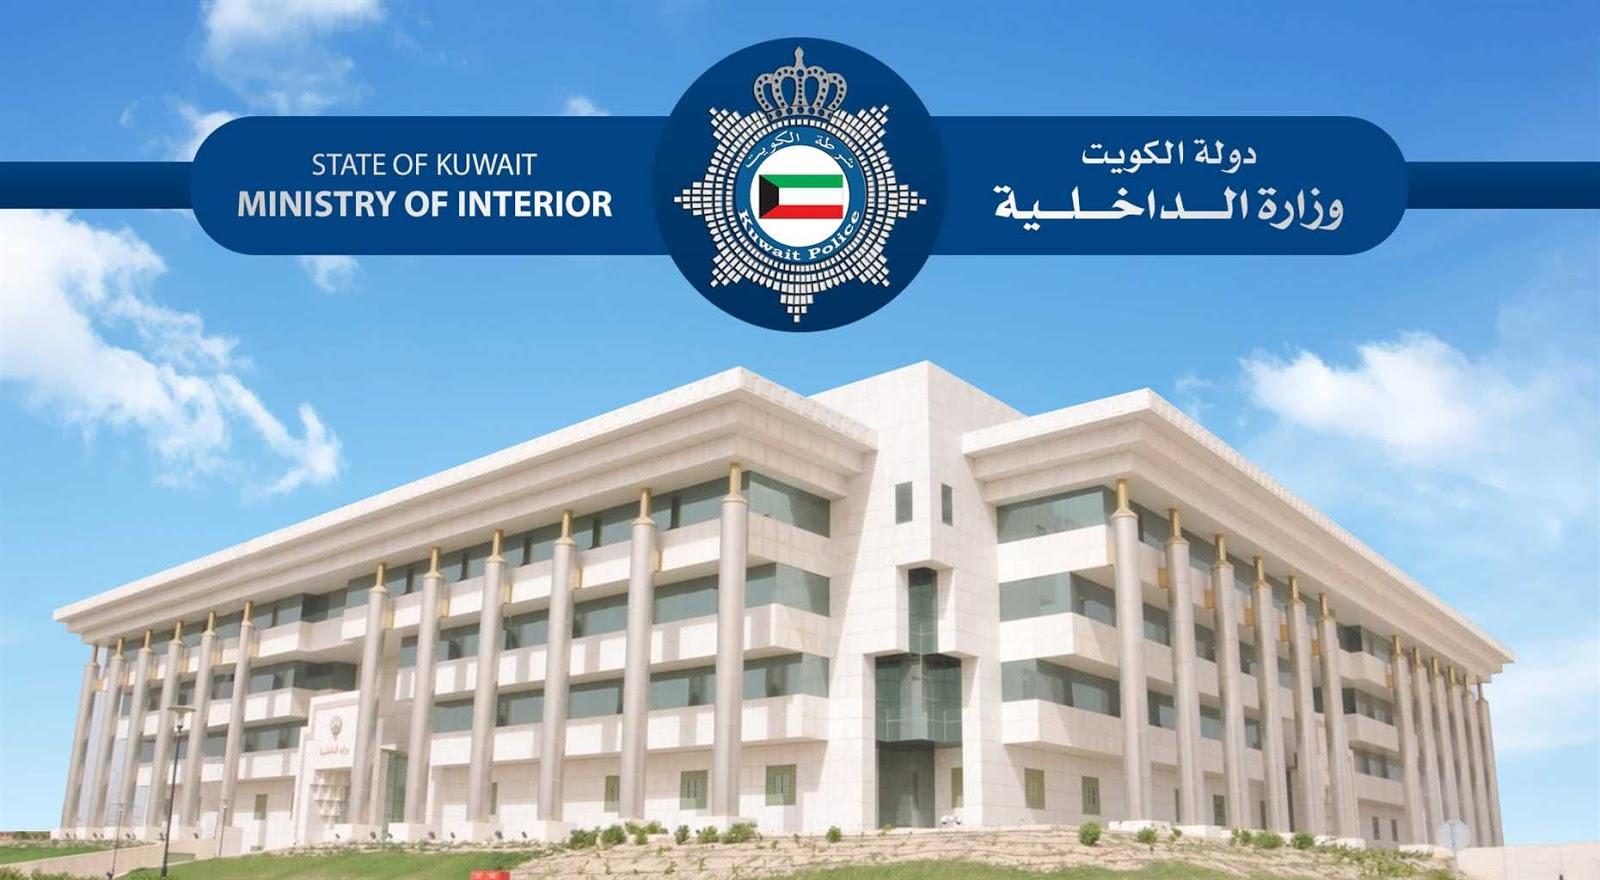 574826 o 1 - #وزارة_الداخلية توضح بخصوص تقاعد اللواء علي الفارس